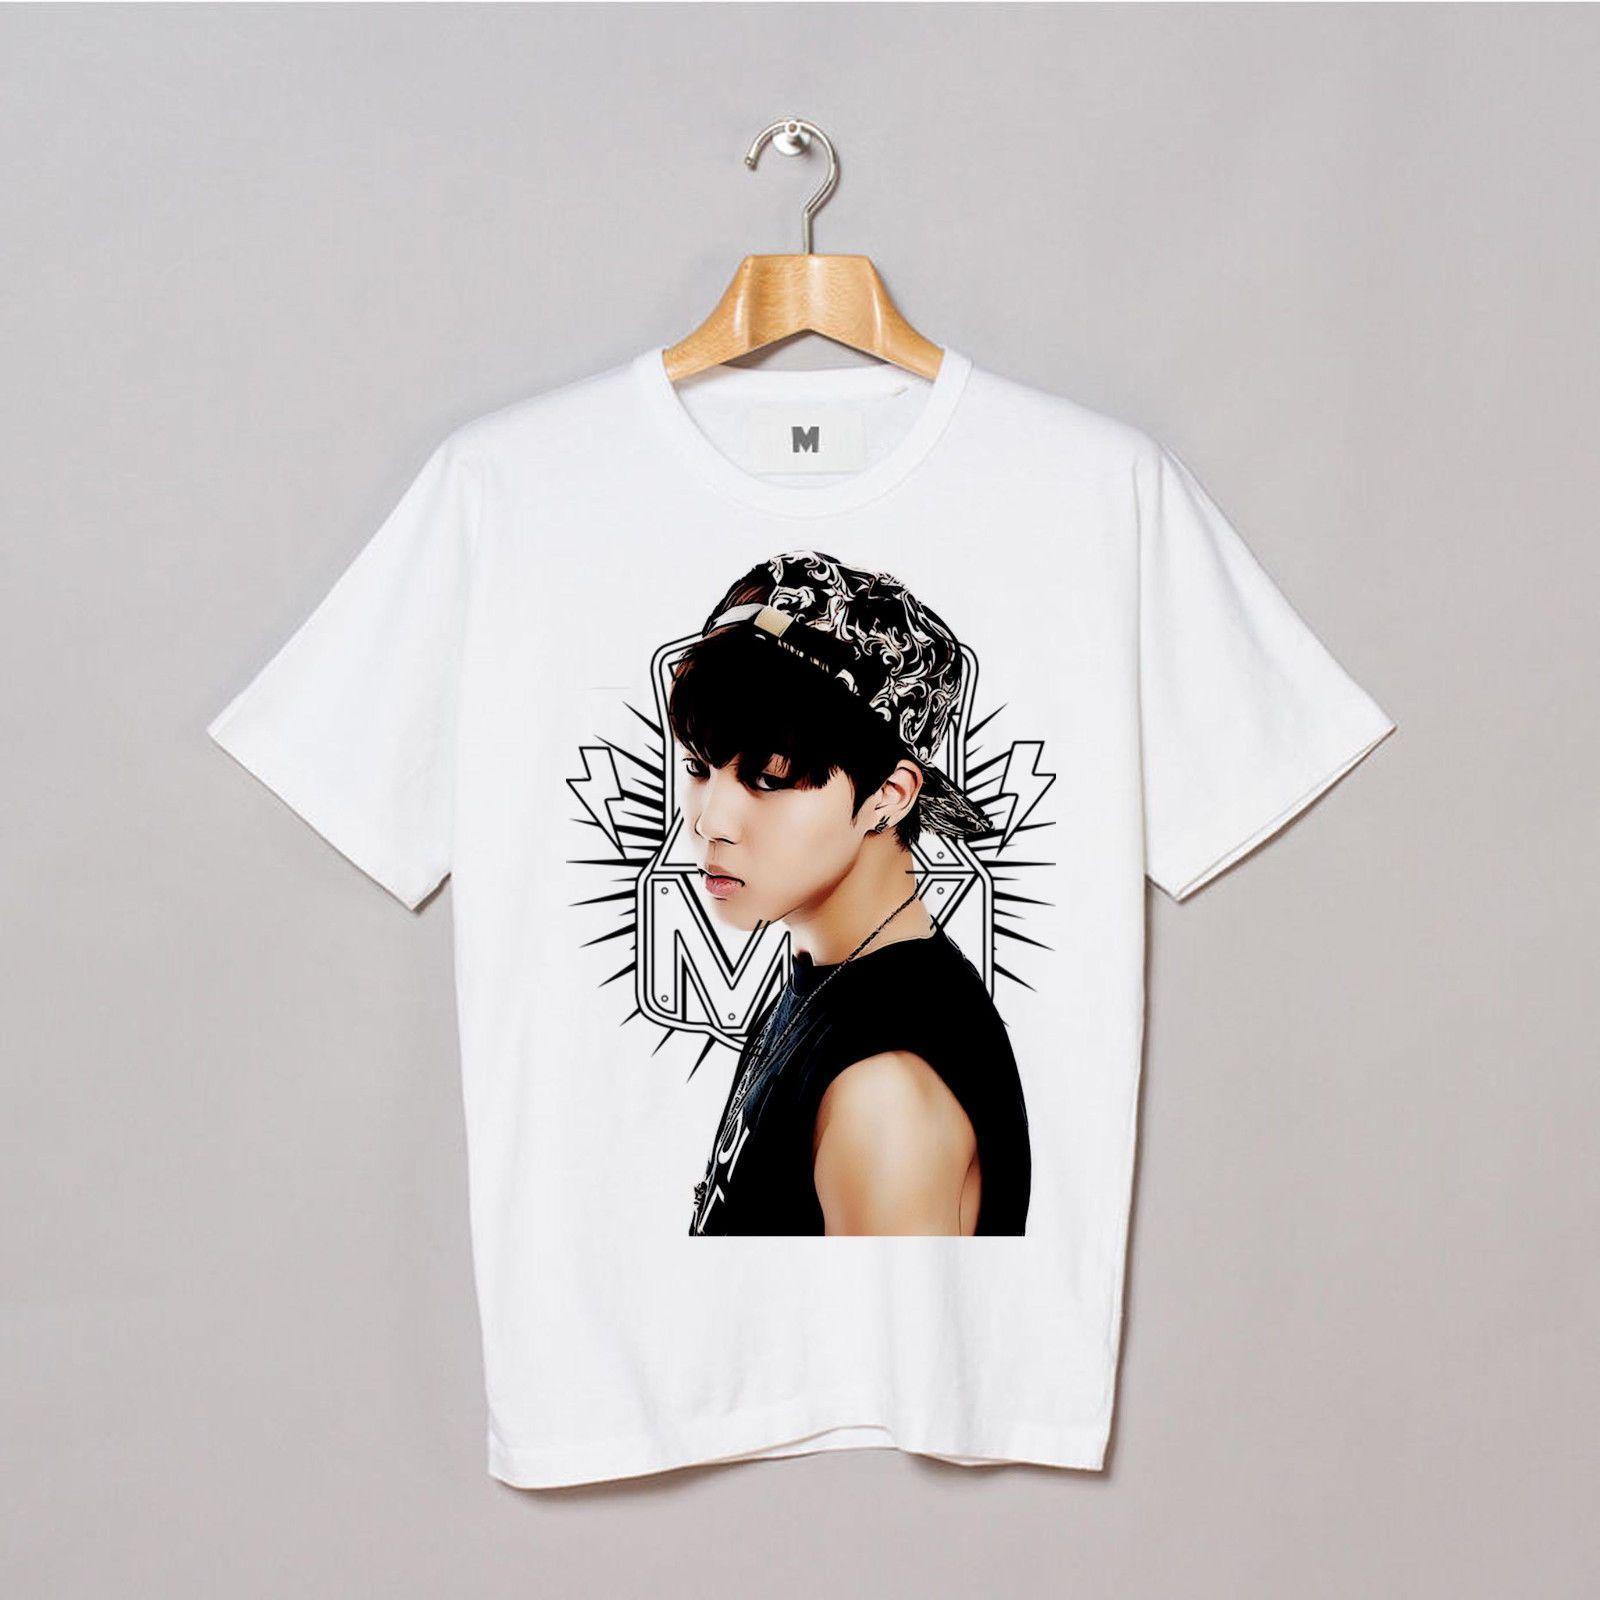 Park Jimin Bts Bangtan Boys Kpop K Pop 2 T Shirt Tee Short Sleeve T Shirts For Women Tee Shirts Shirts